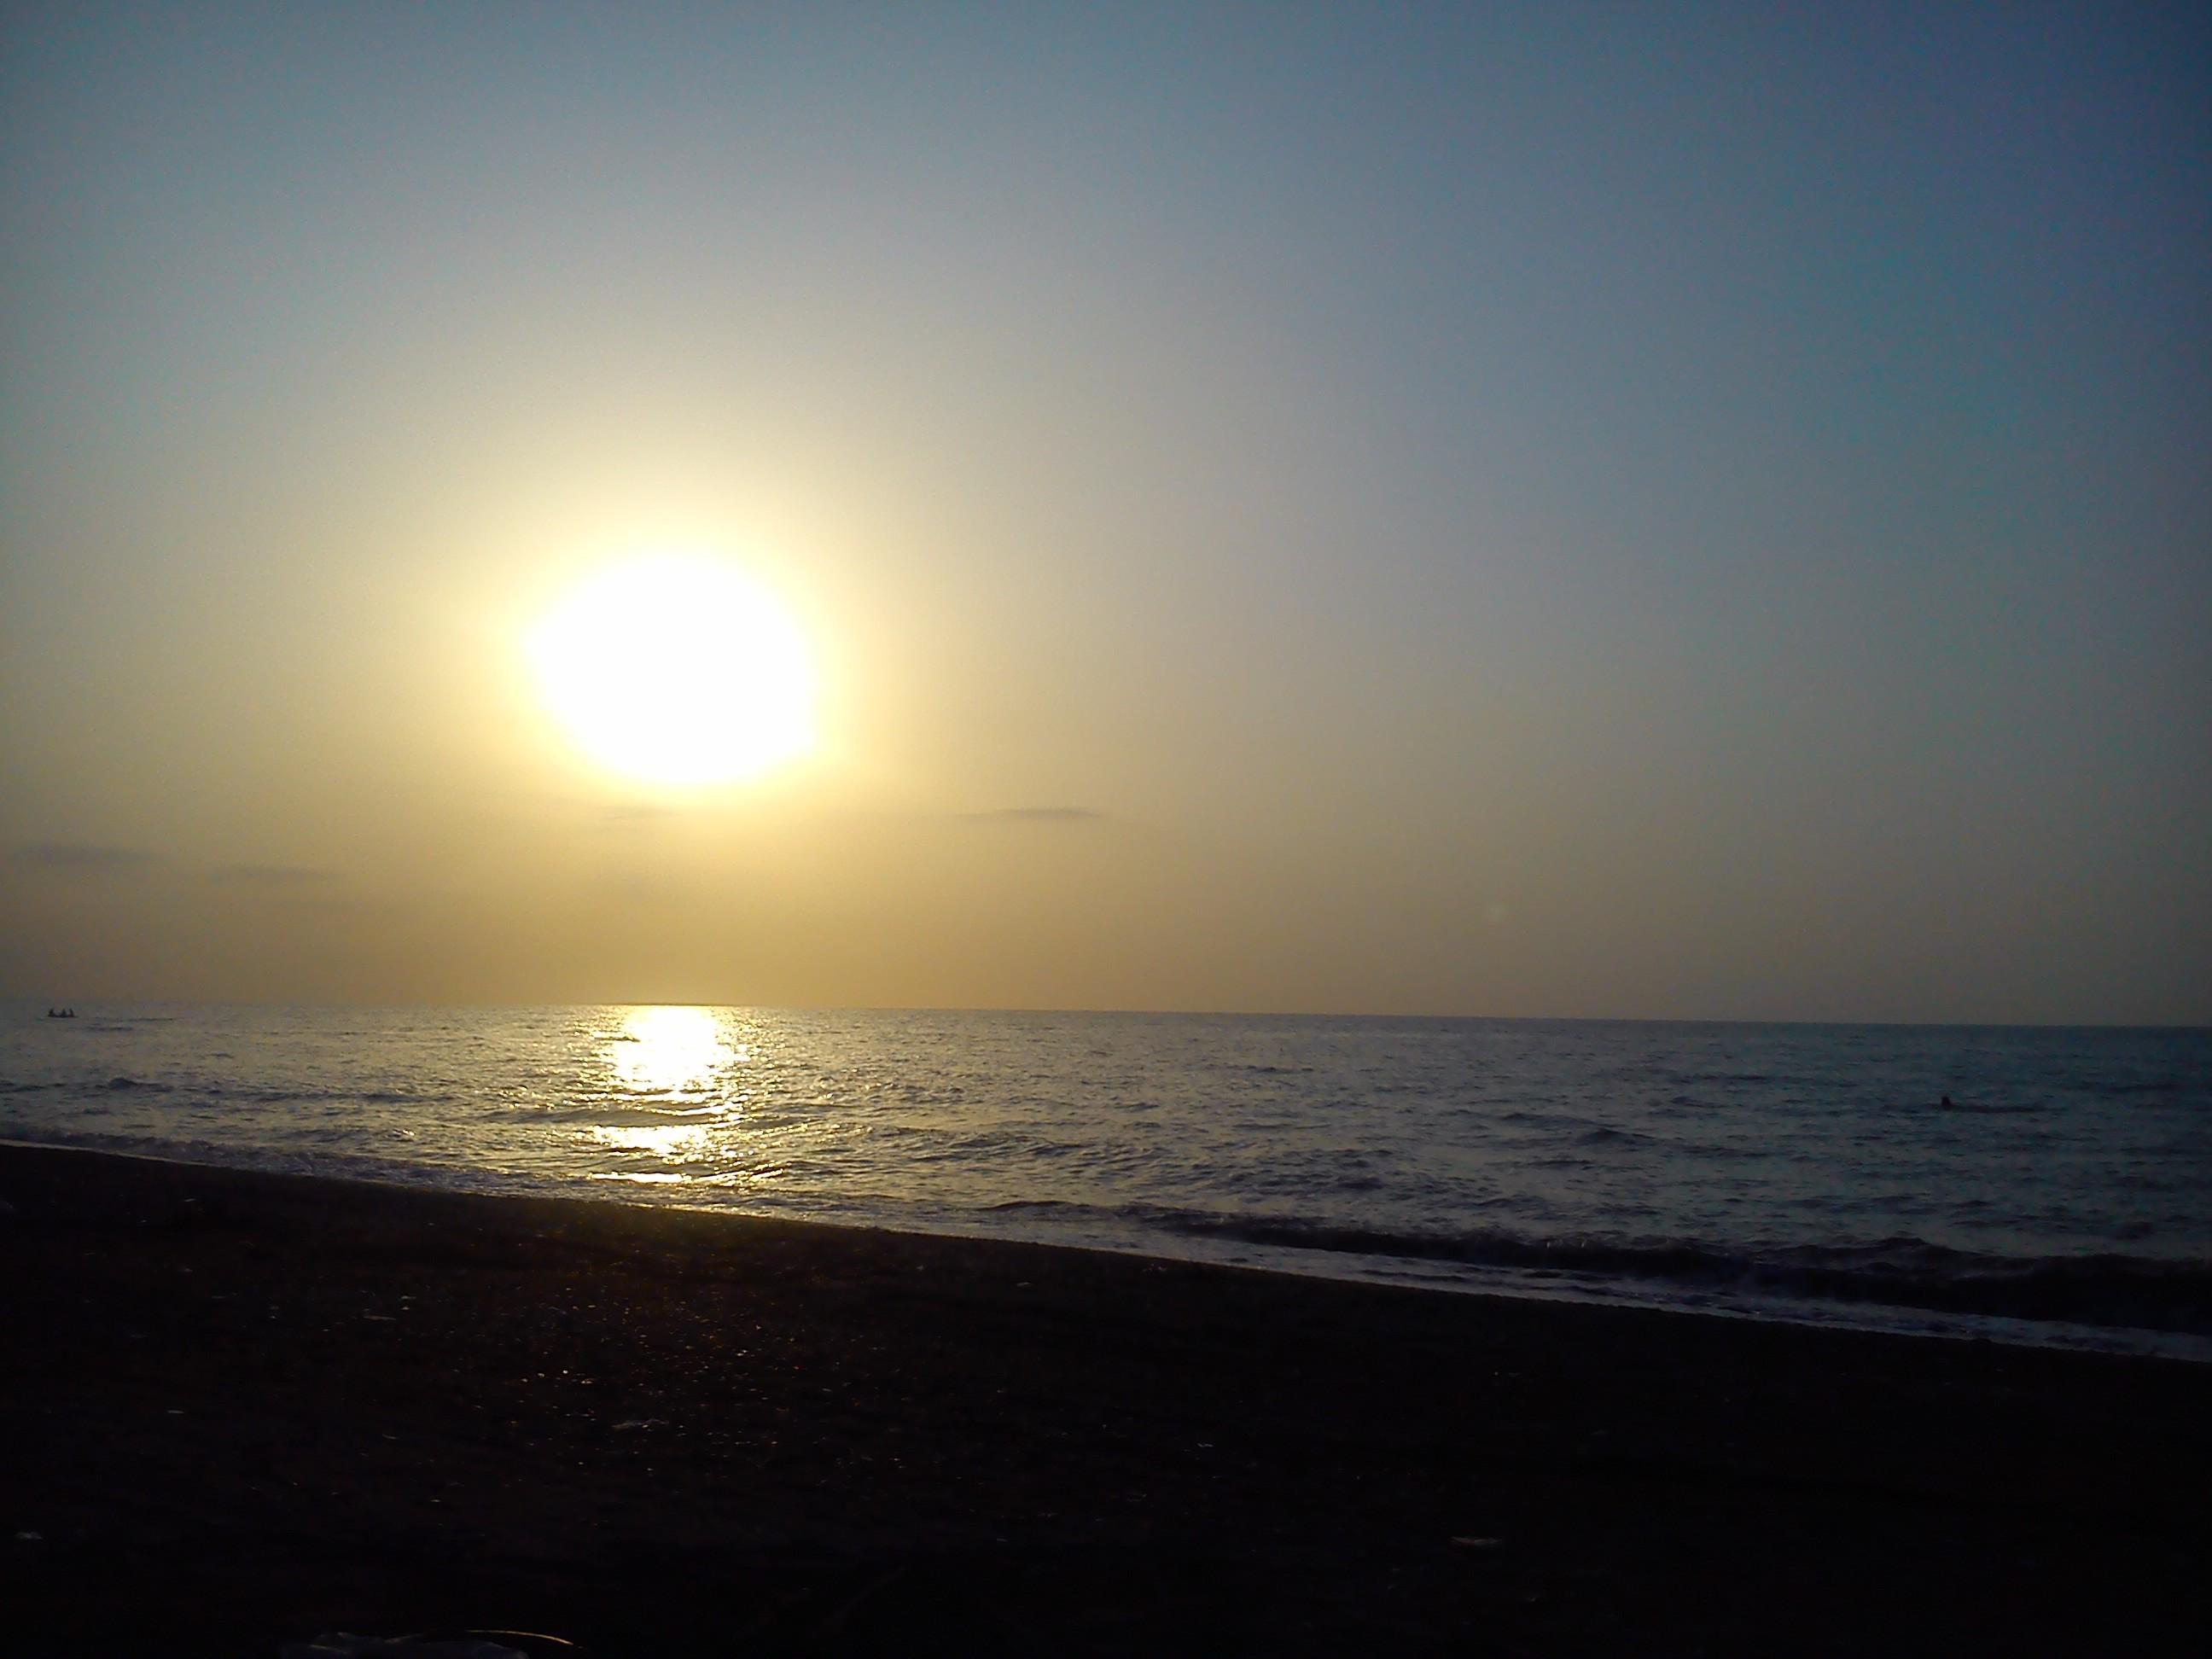 ساحل مرمر